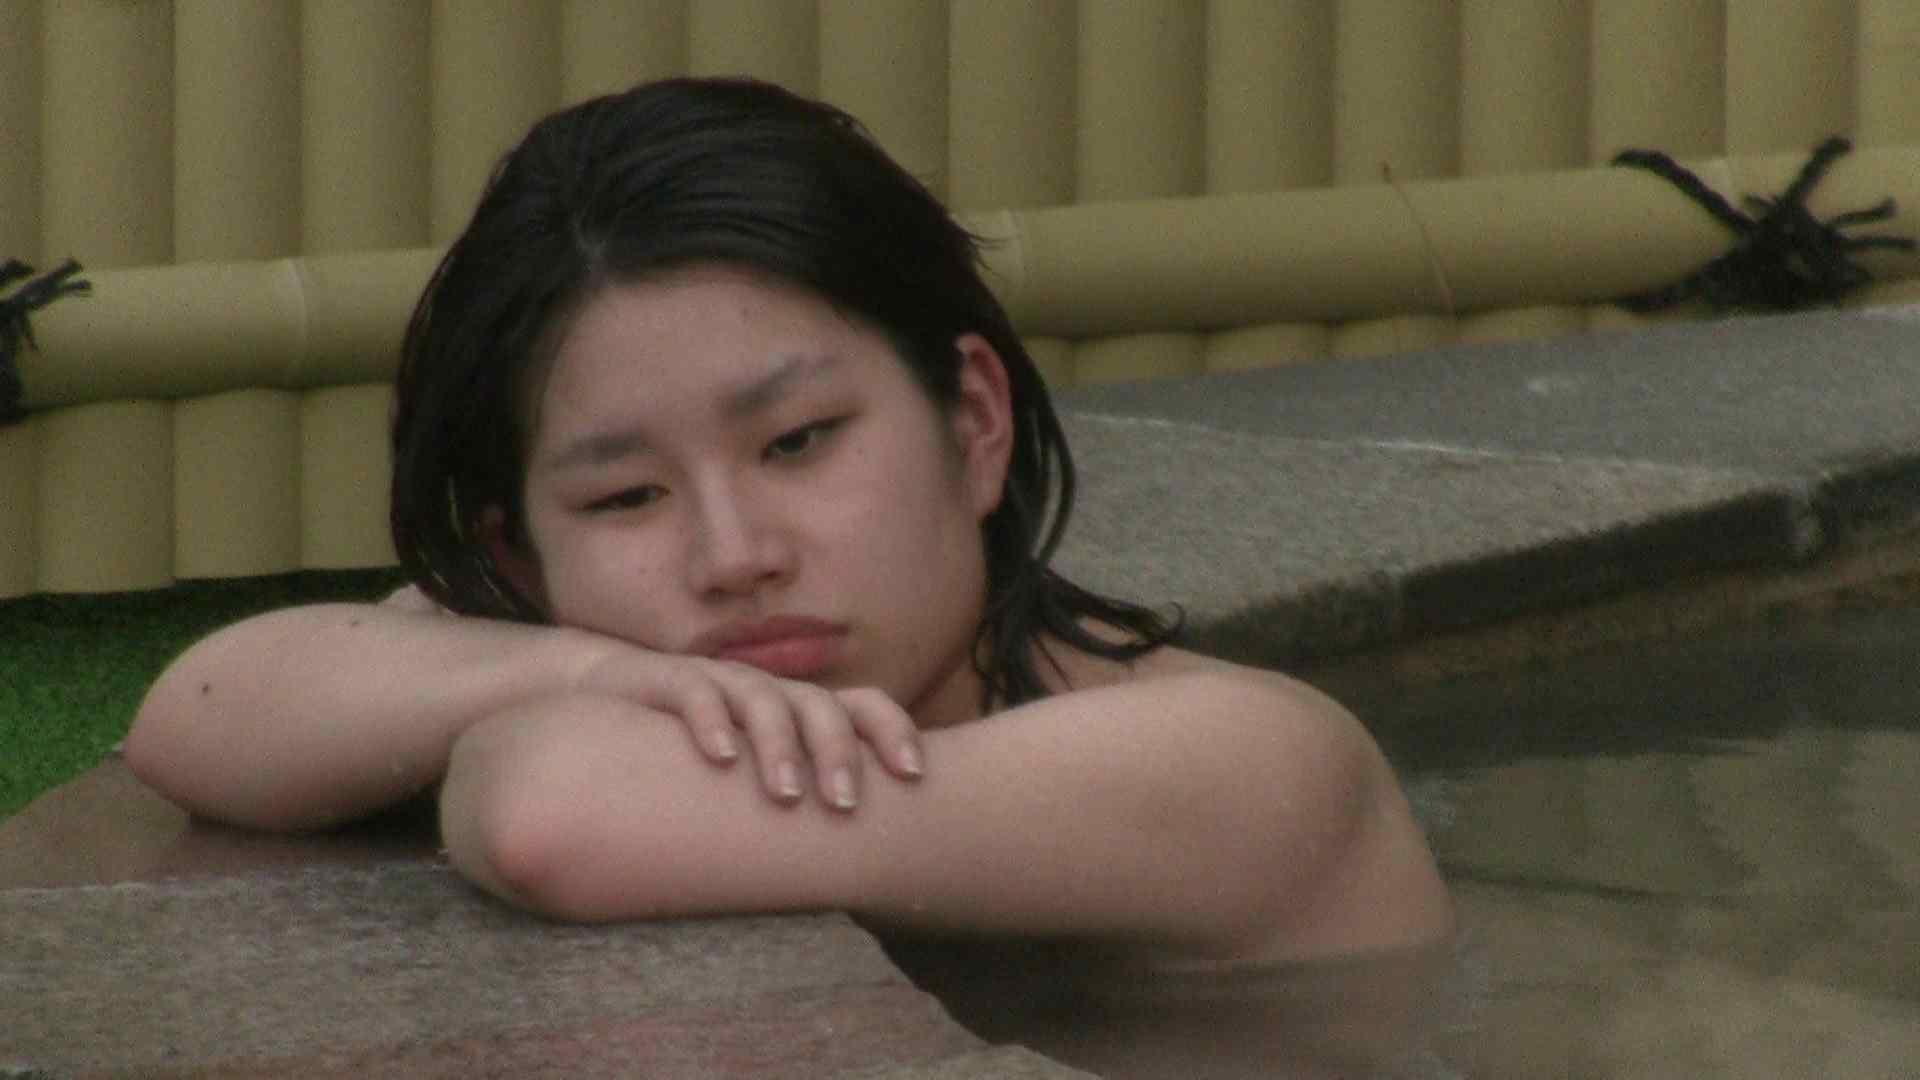 Aquaな露天風呂Vol.230 HなOL | 盗撮  83pic 37